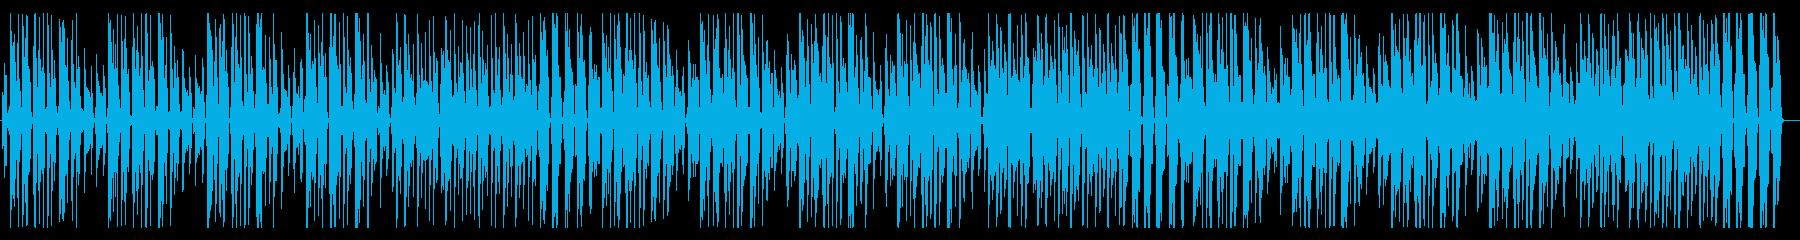 YouTube ピアノ・コミカル・軽快の再生済みの波形